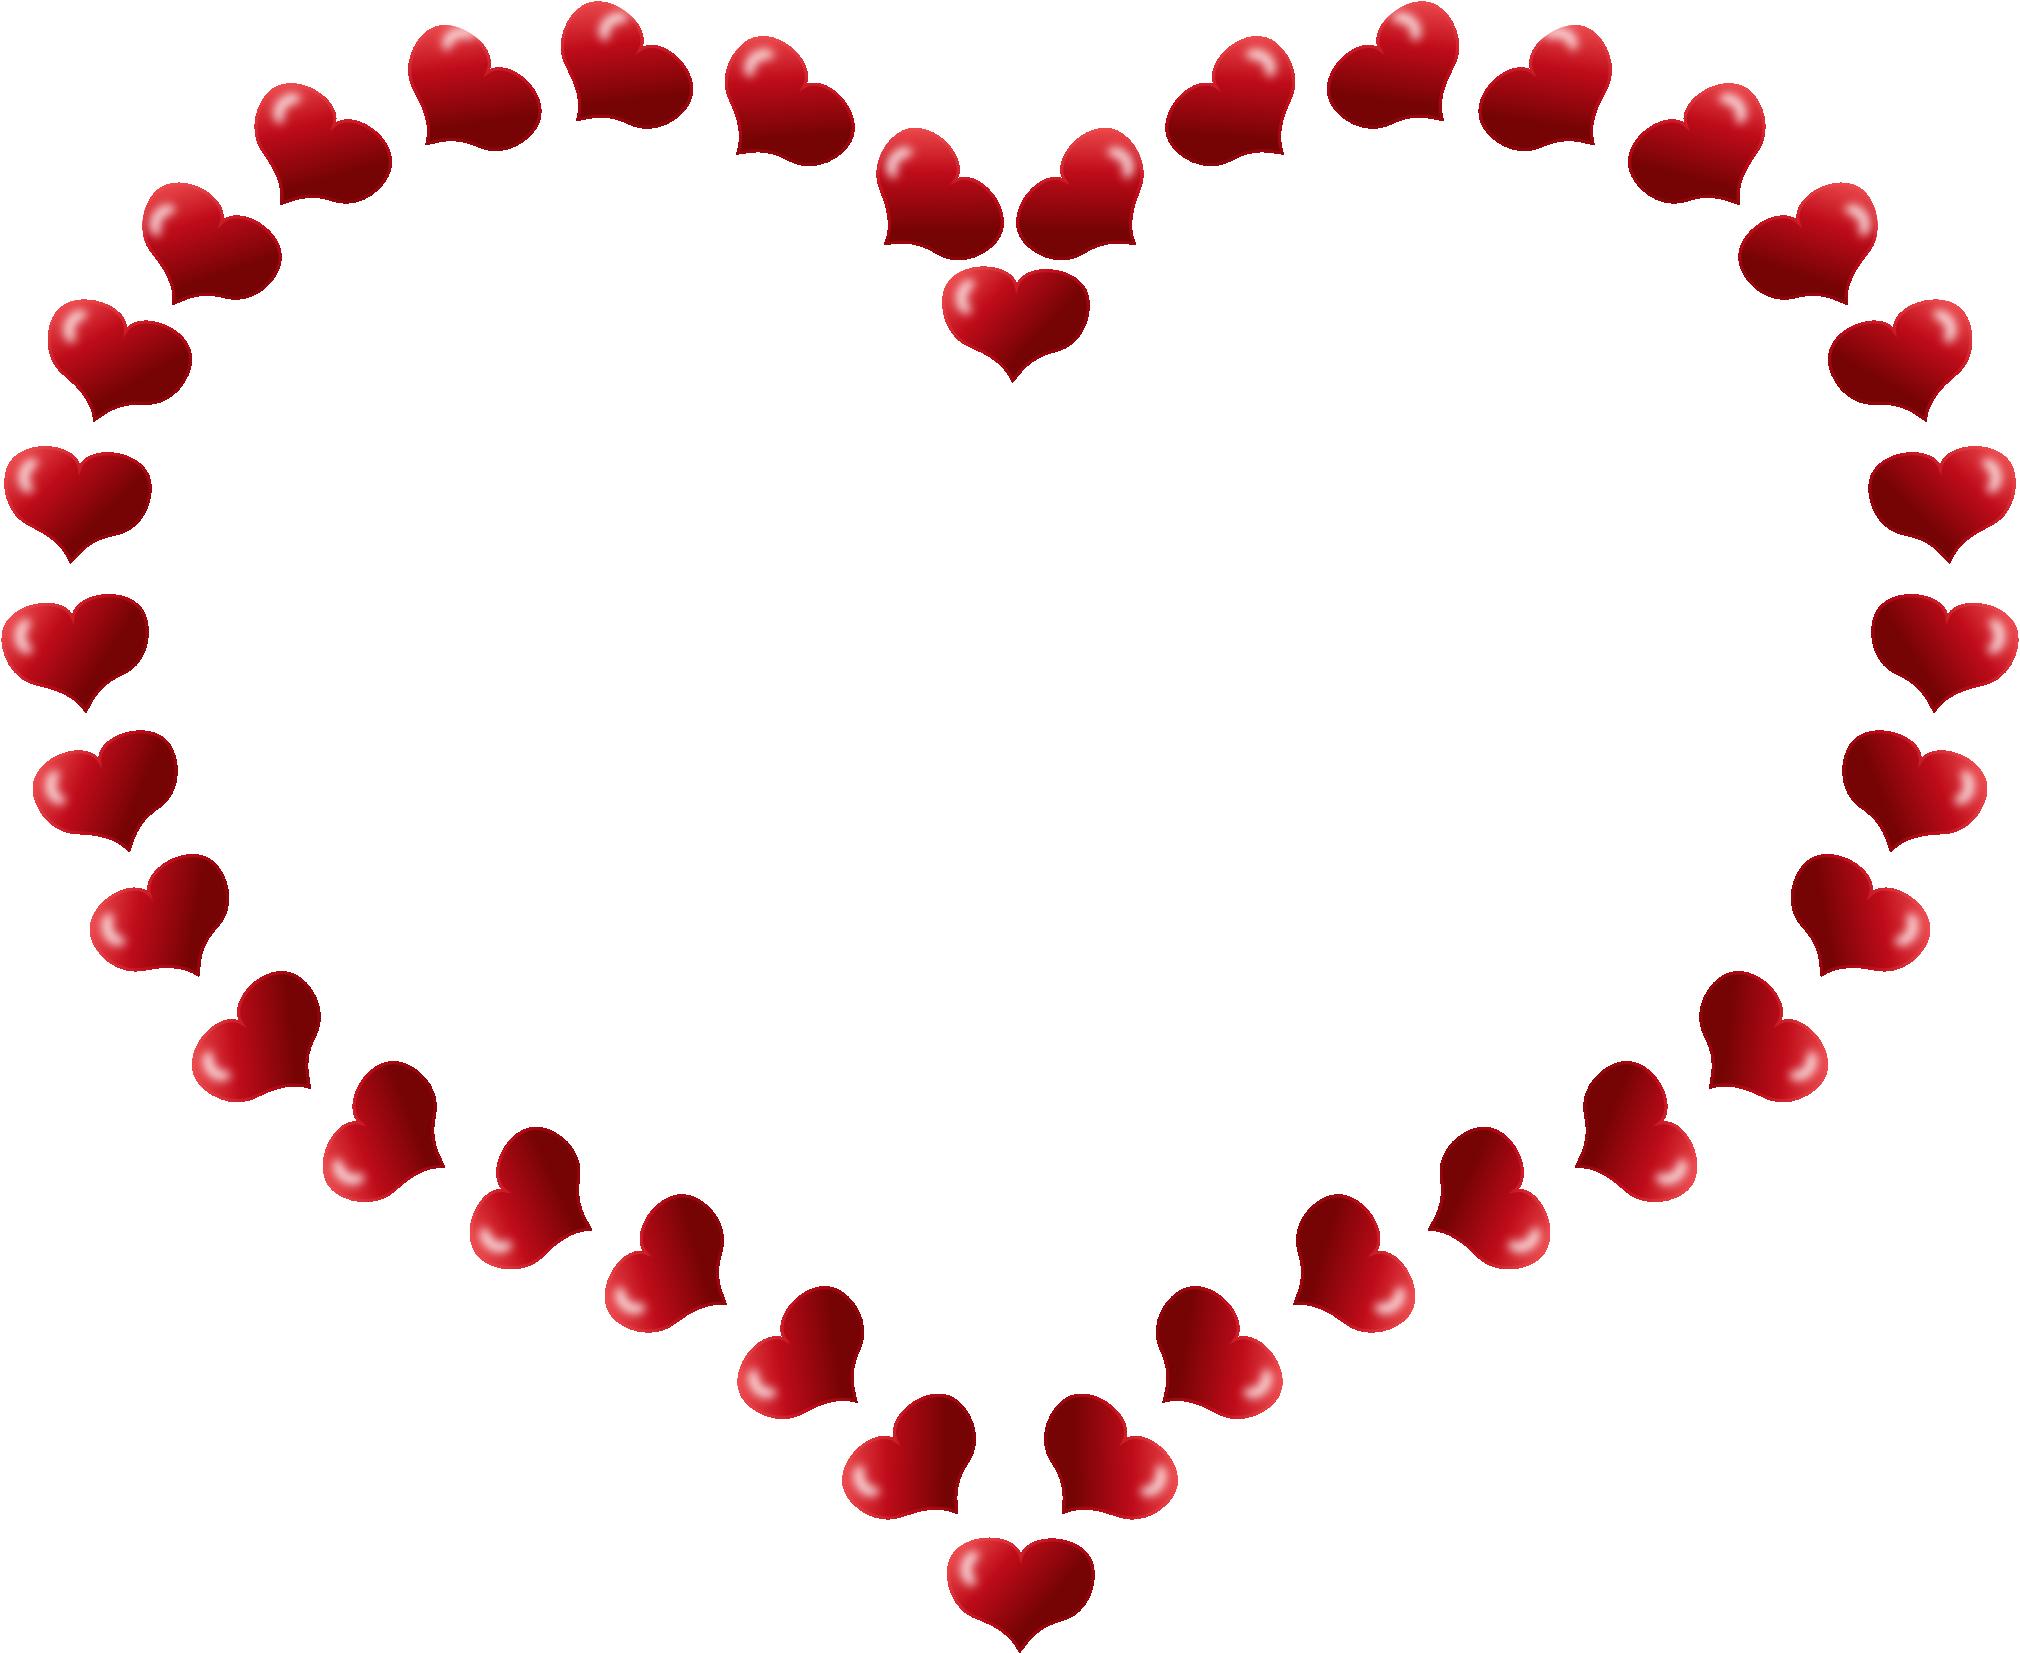 Heart Border Clip Art | Clipart Panda - Free Clipart Images ... svg free download